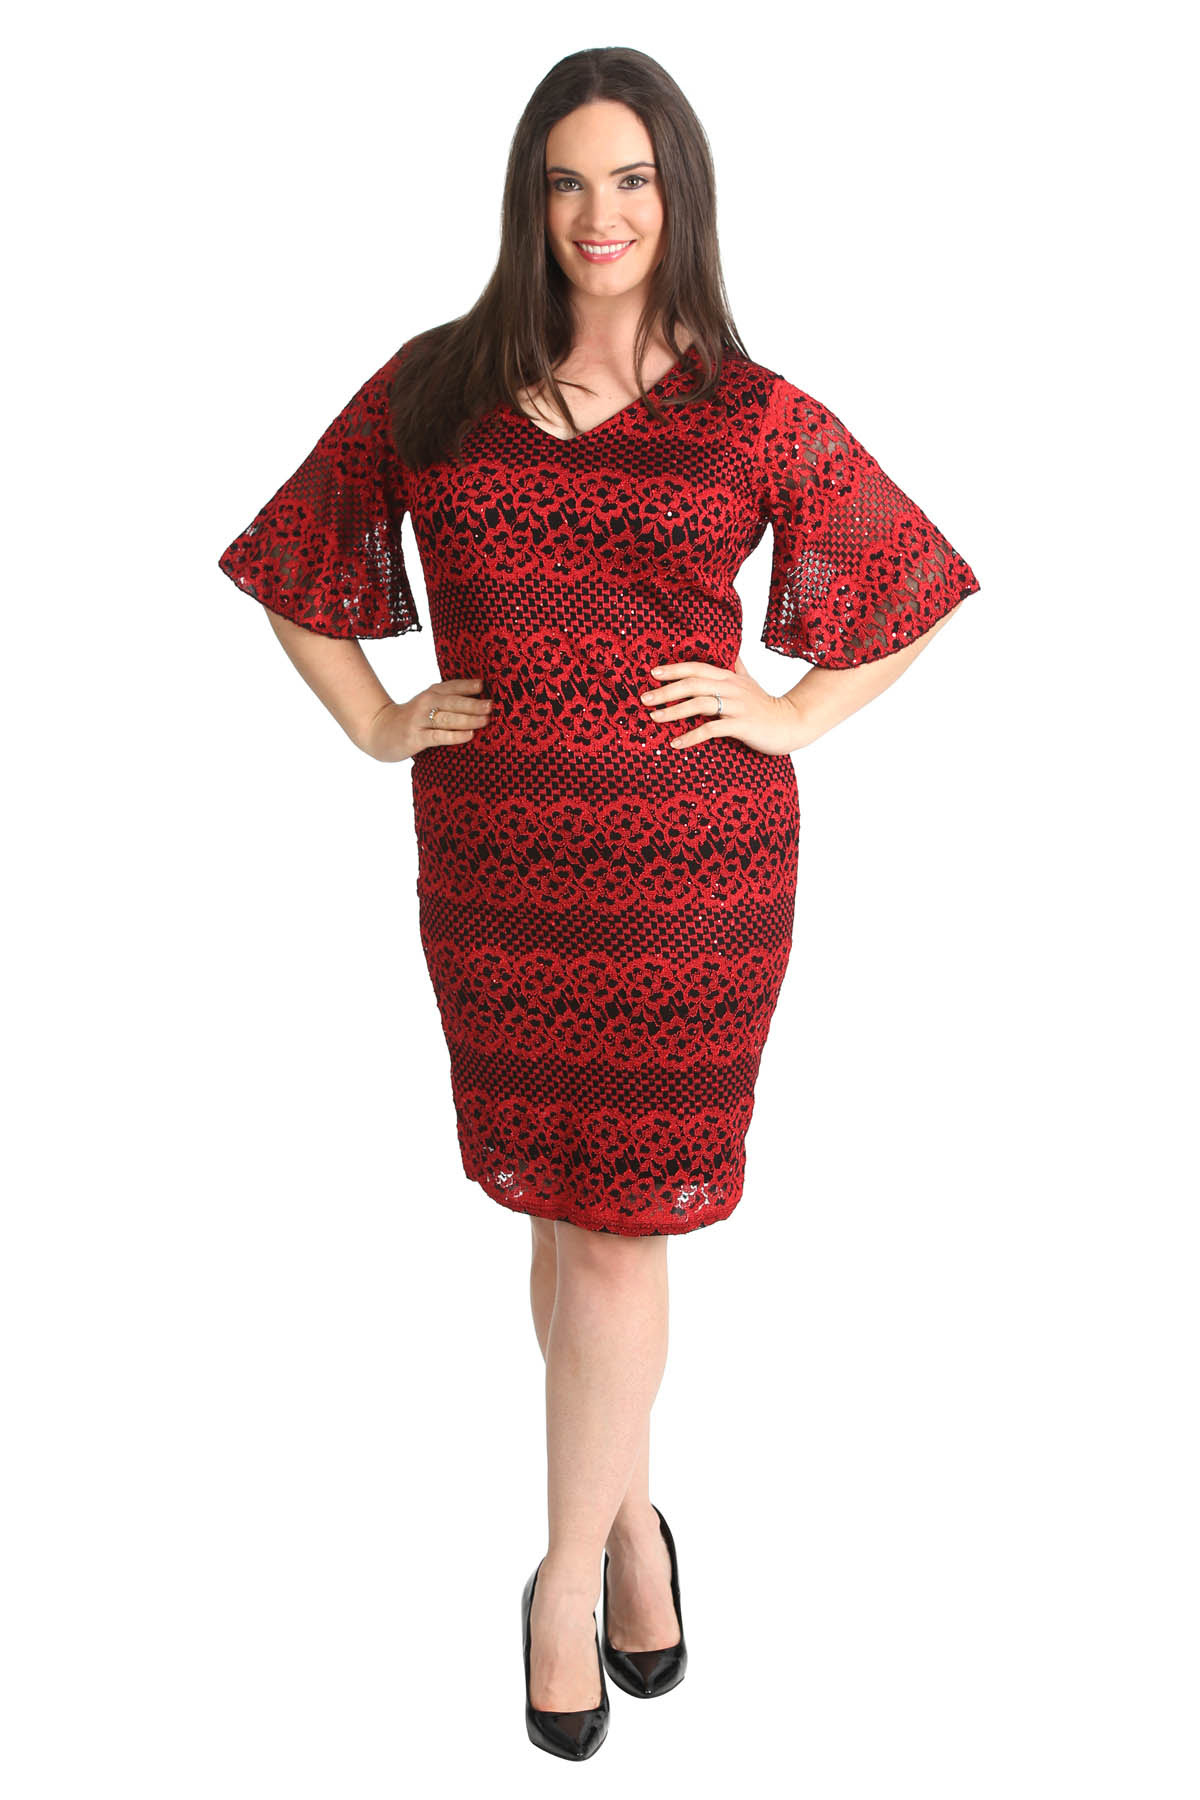 Boutique sequin bodycon dress plus size usa consignment shops